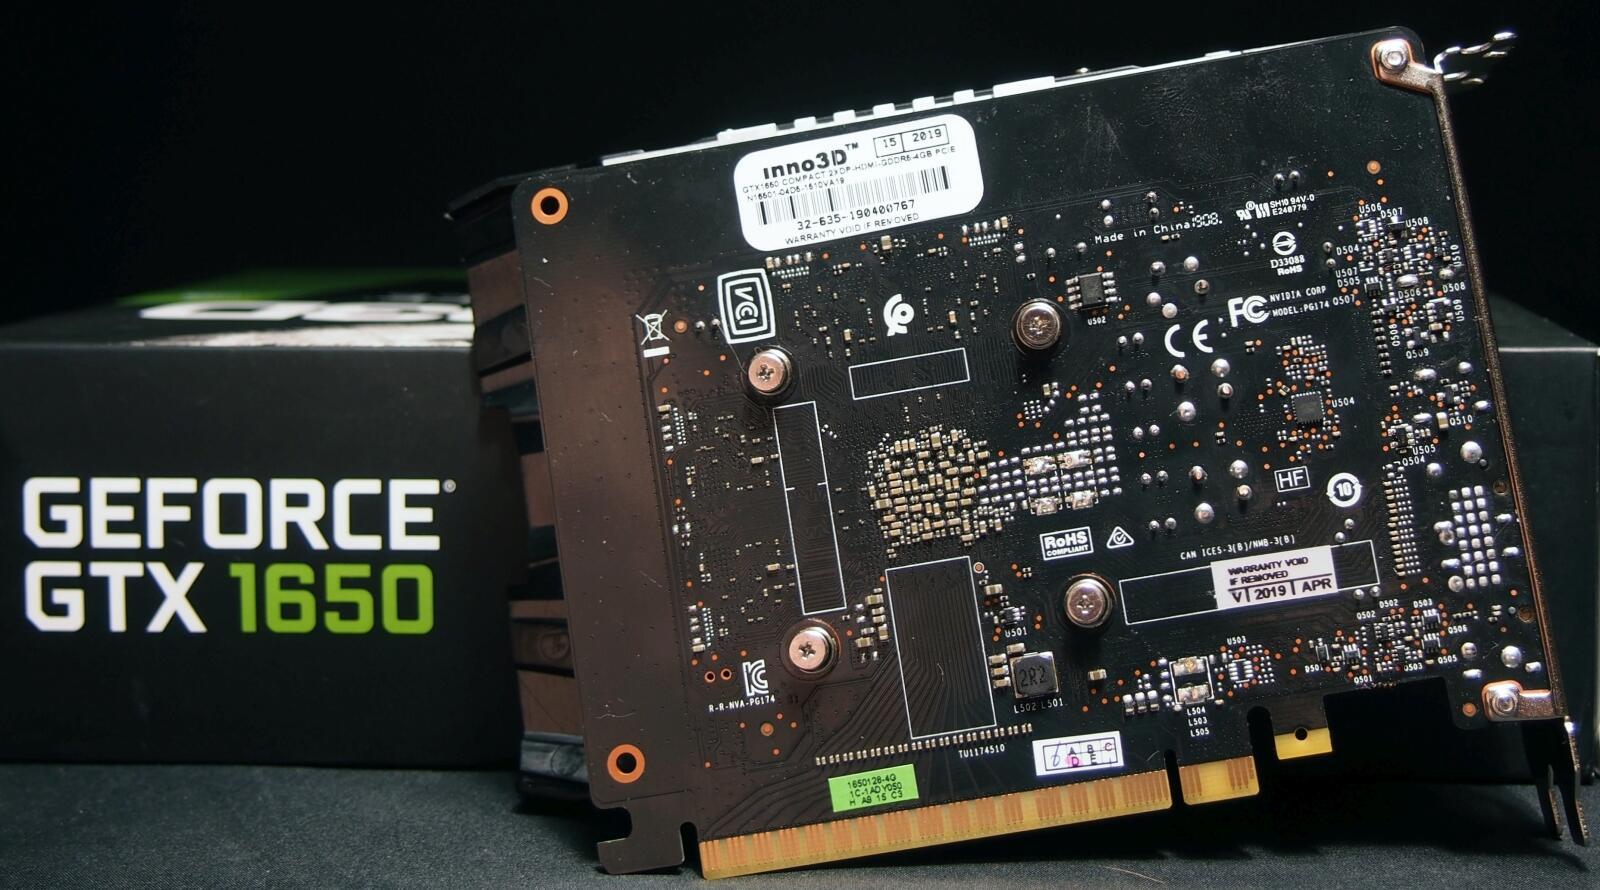 Videokarty - Obzor videokarty Inno3D GeForce GTX 1650 COMPACT [N16501-04D5-1510VA19]